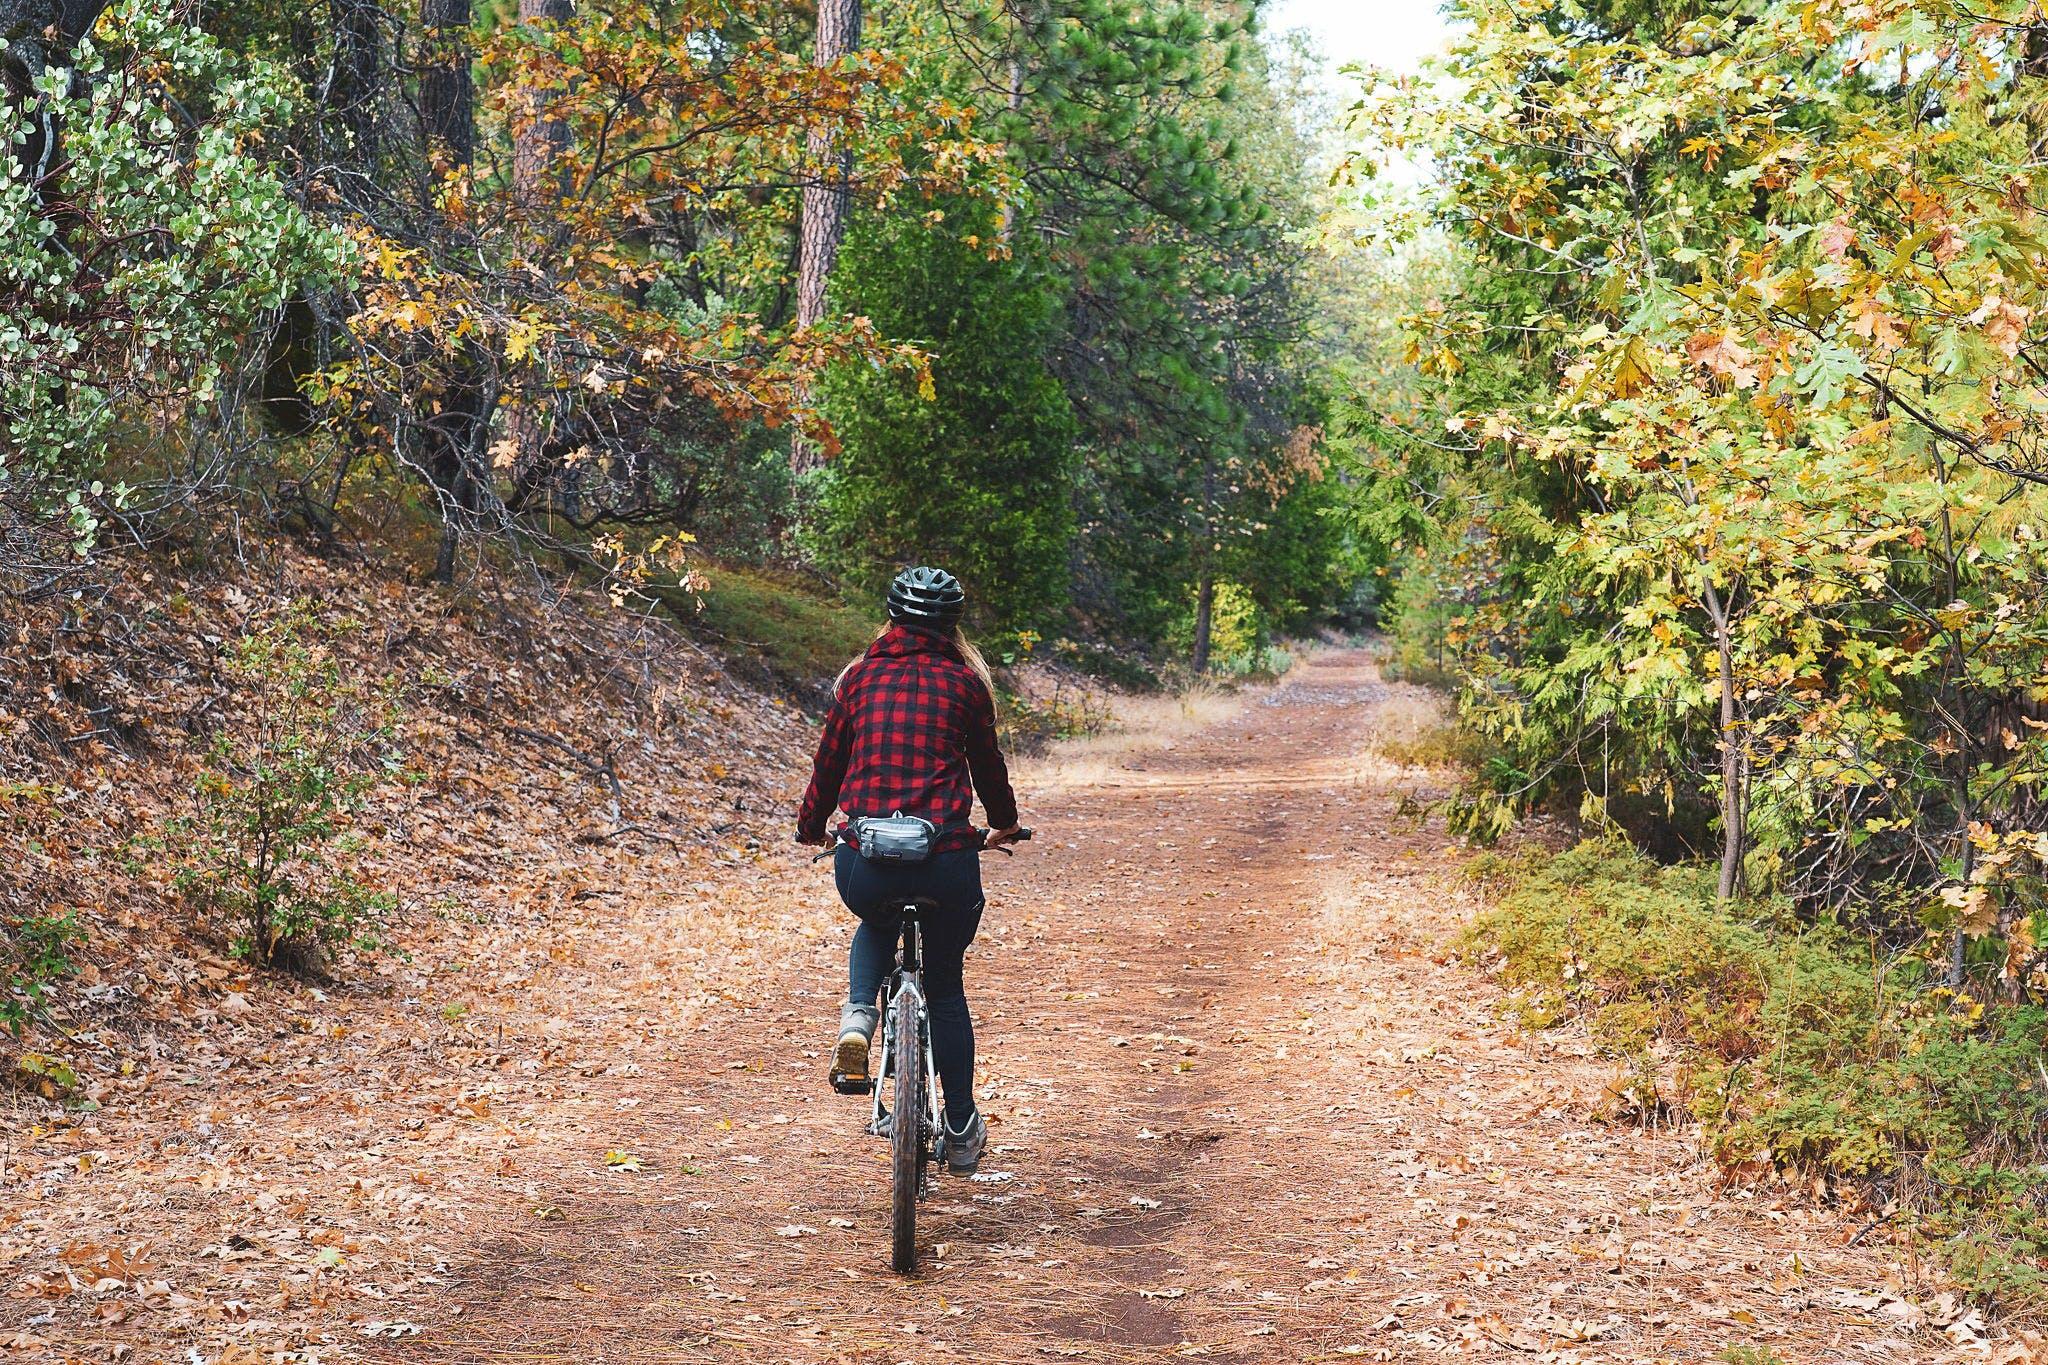 Bike The El Dorado Trail in Apple Hill Placerville